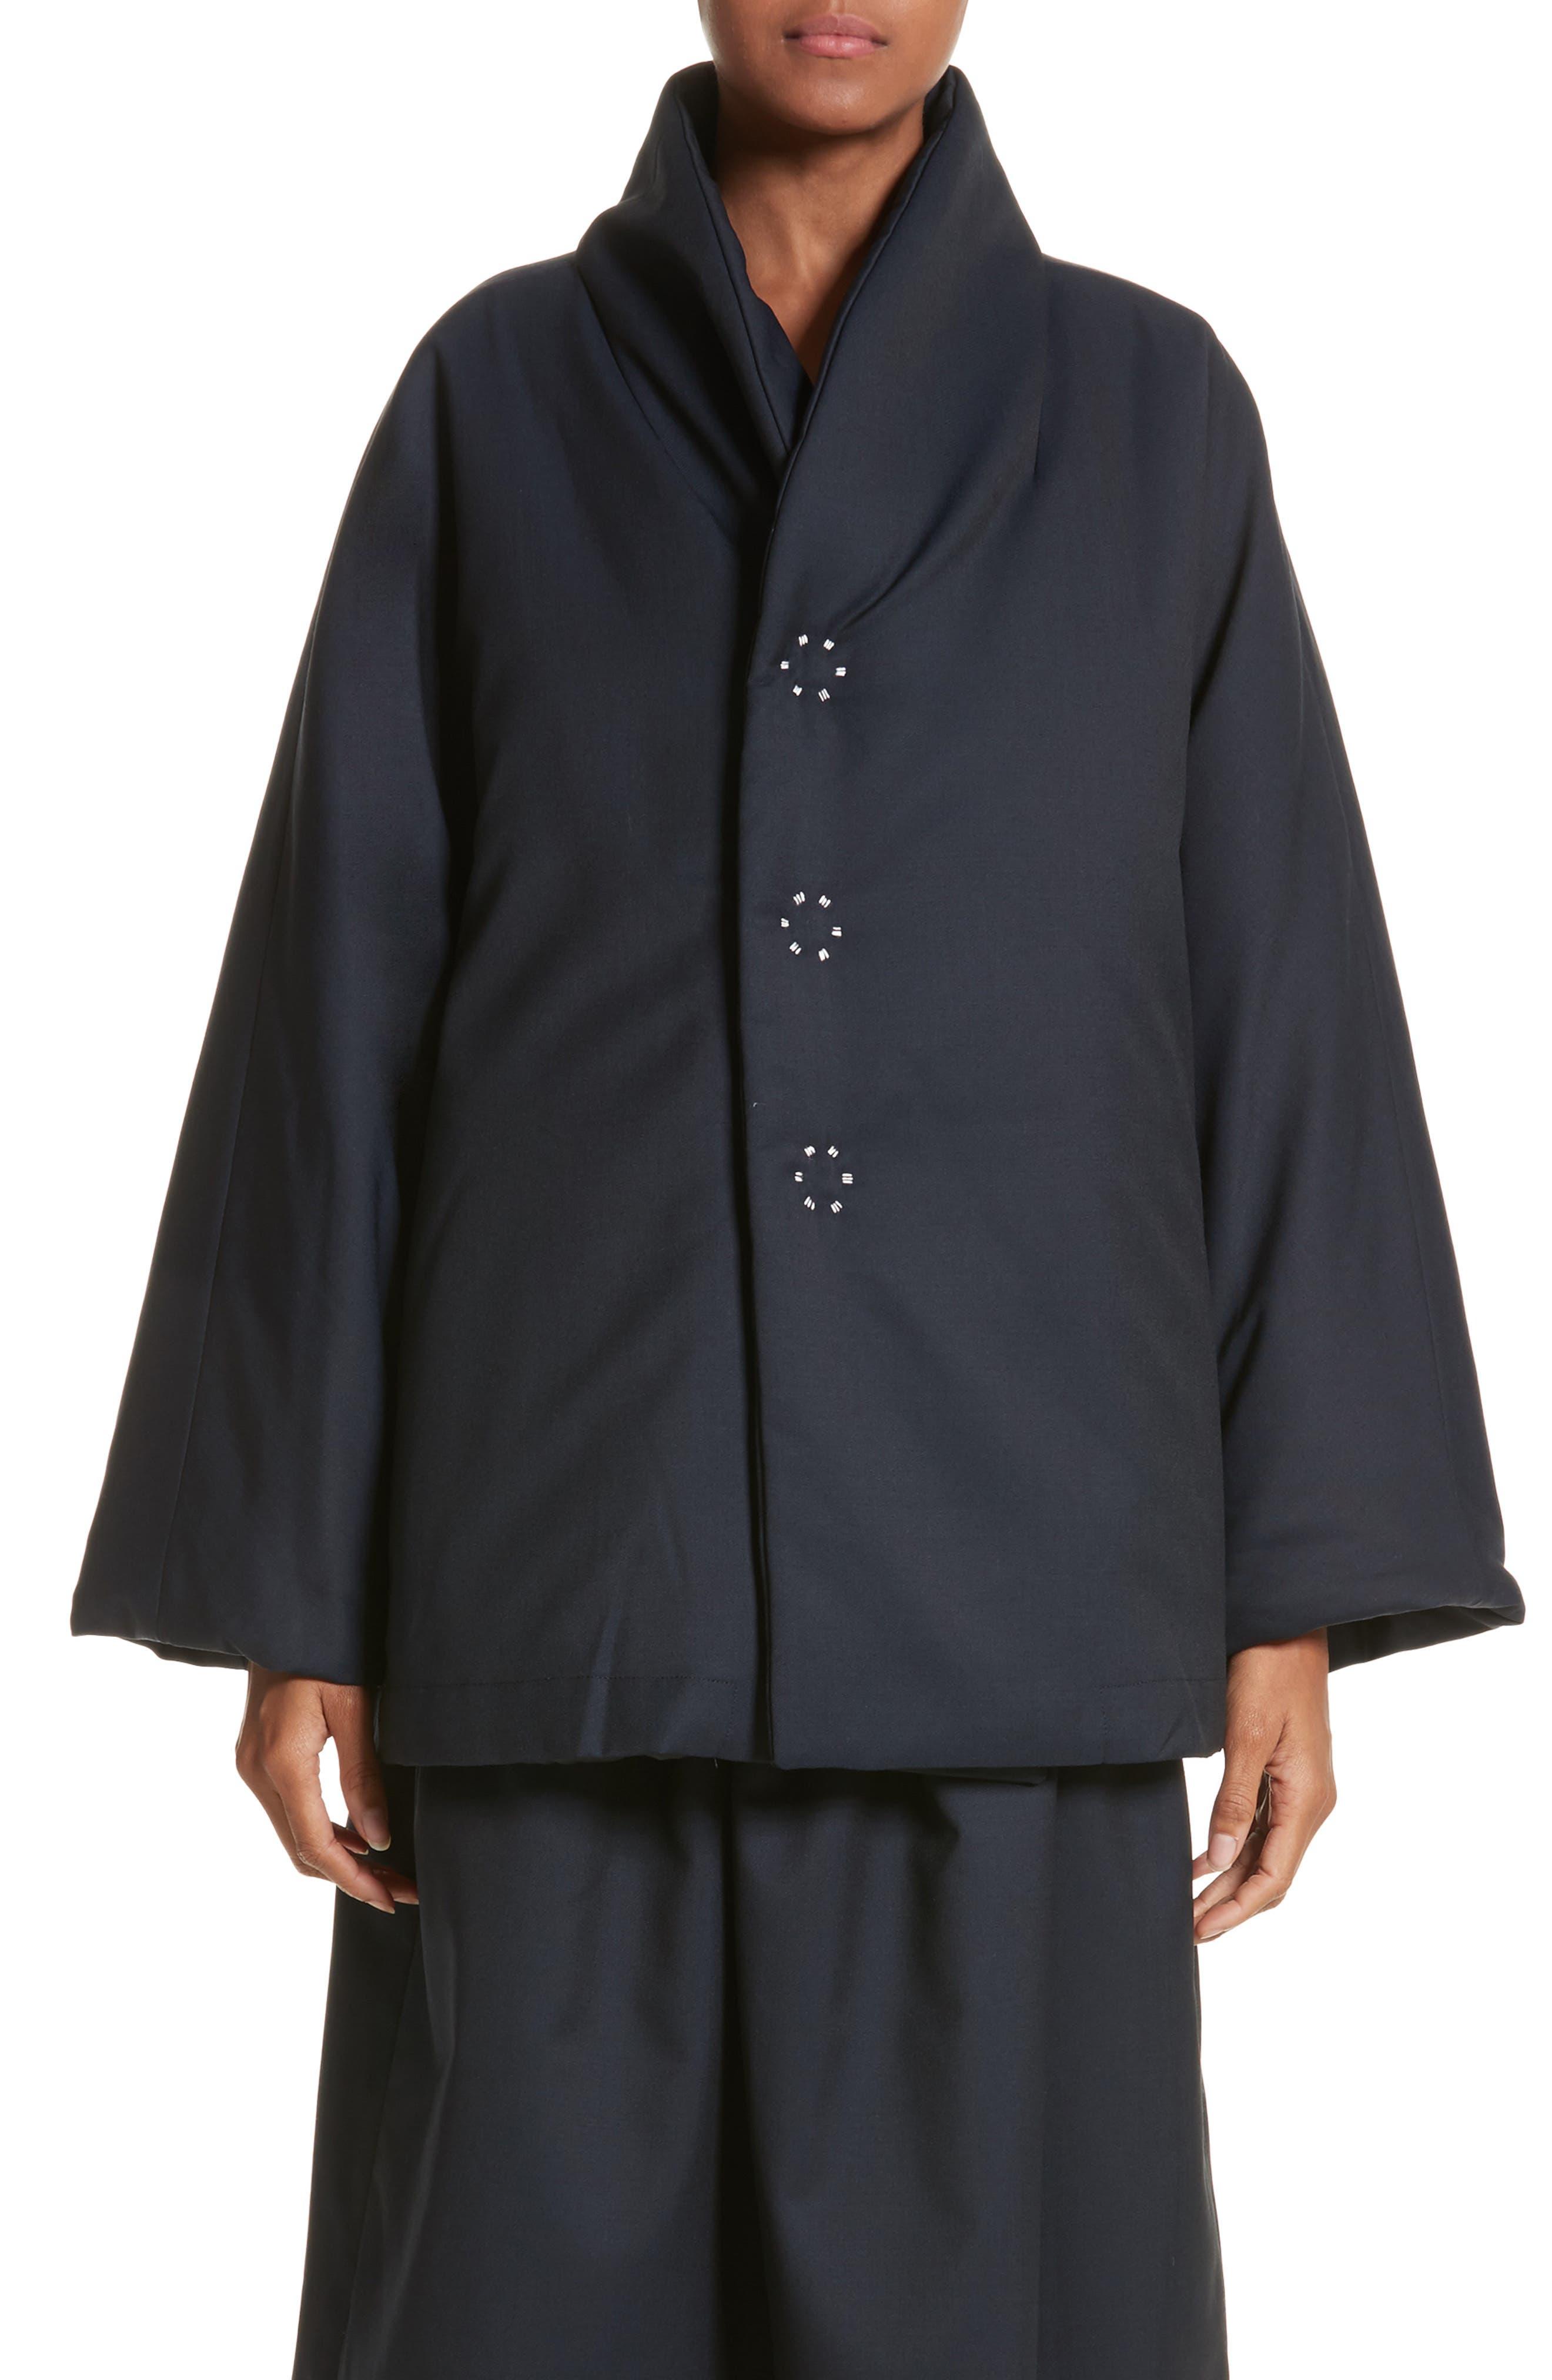 Main Image - Comme des Garçons Quilted A-Line Jacket